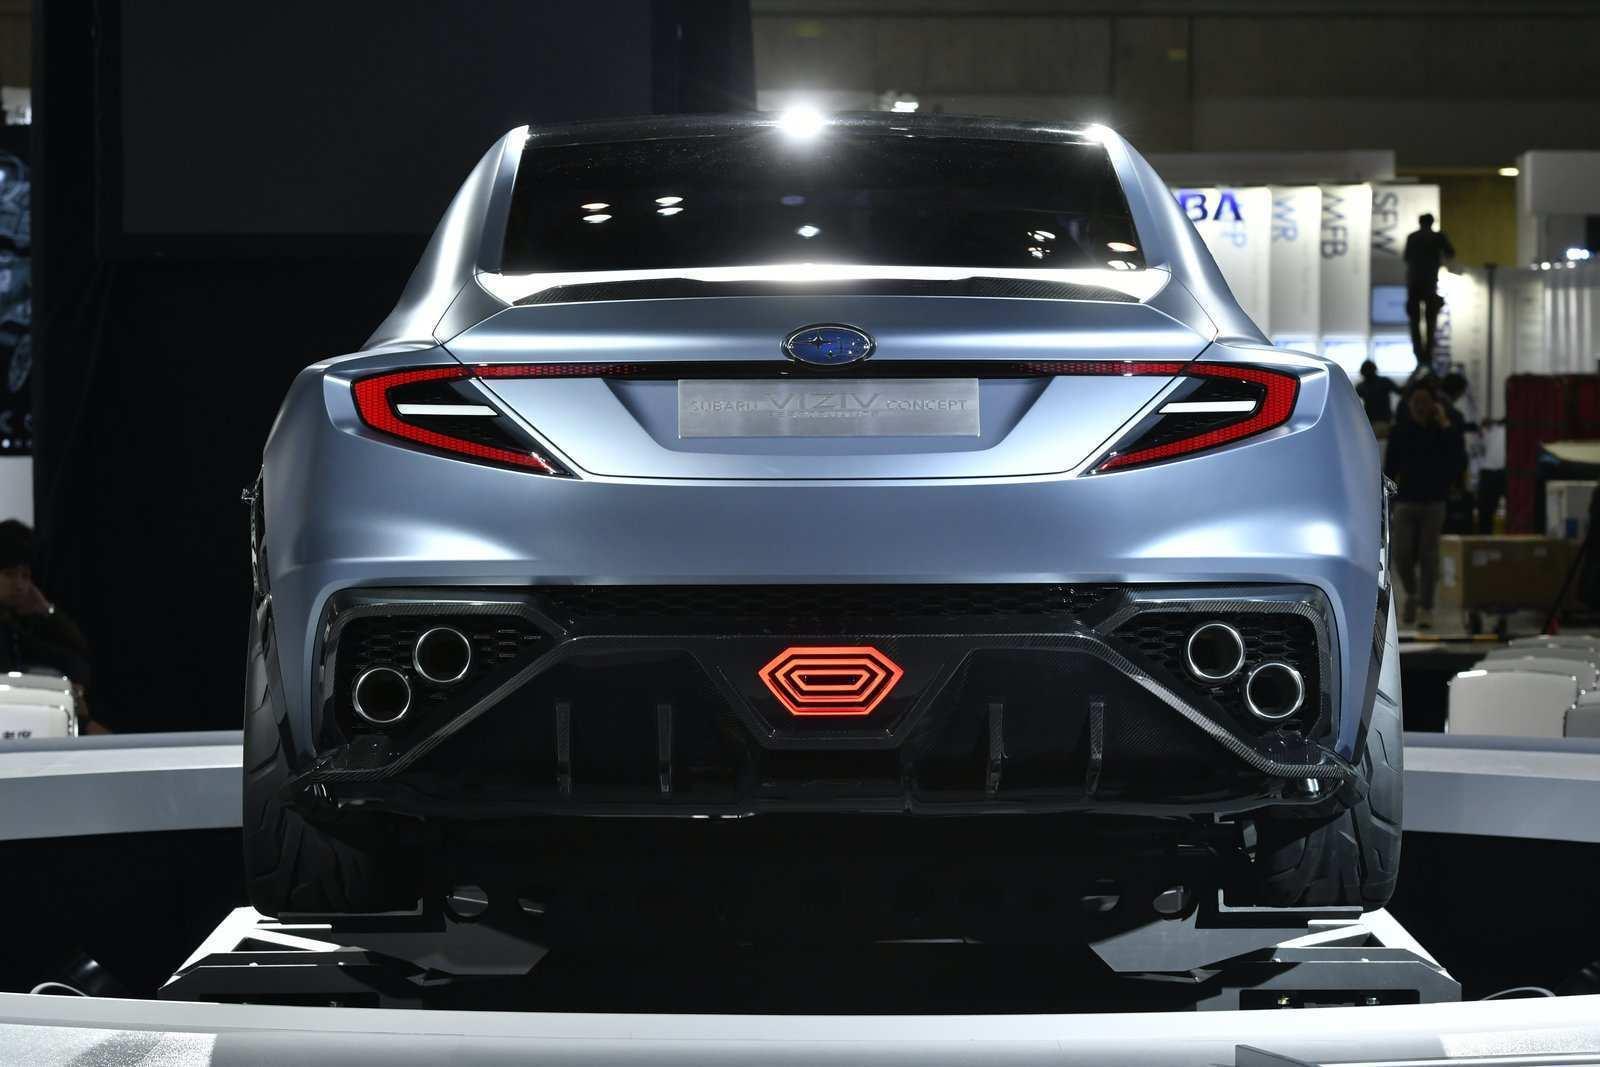 23 Gallery of 2020 Subaru Impreza Wrx Sti Specs and Review for 2020 Subaru Impreza Wrx Sti